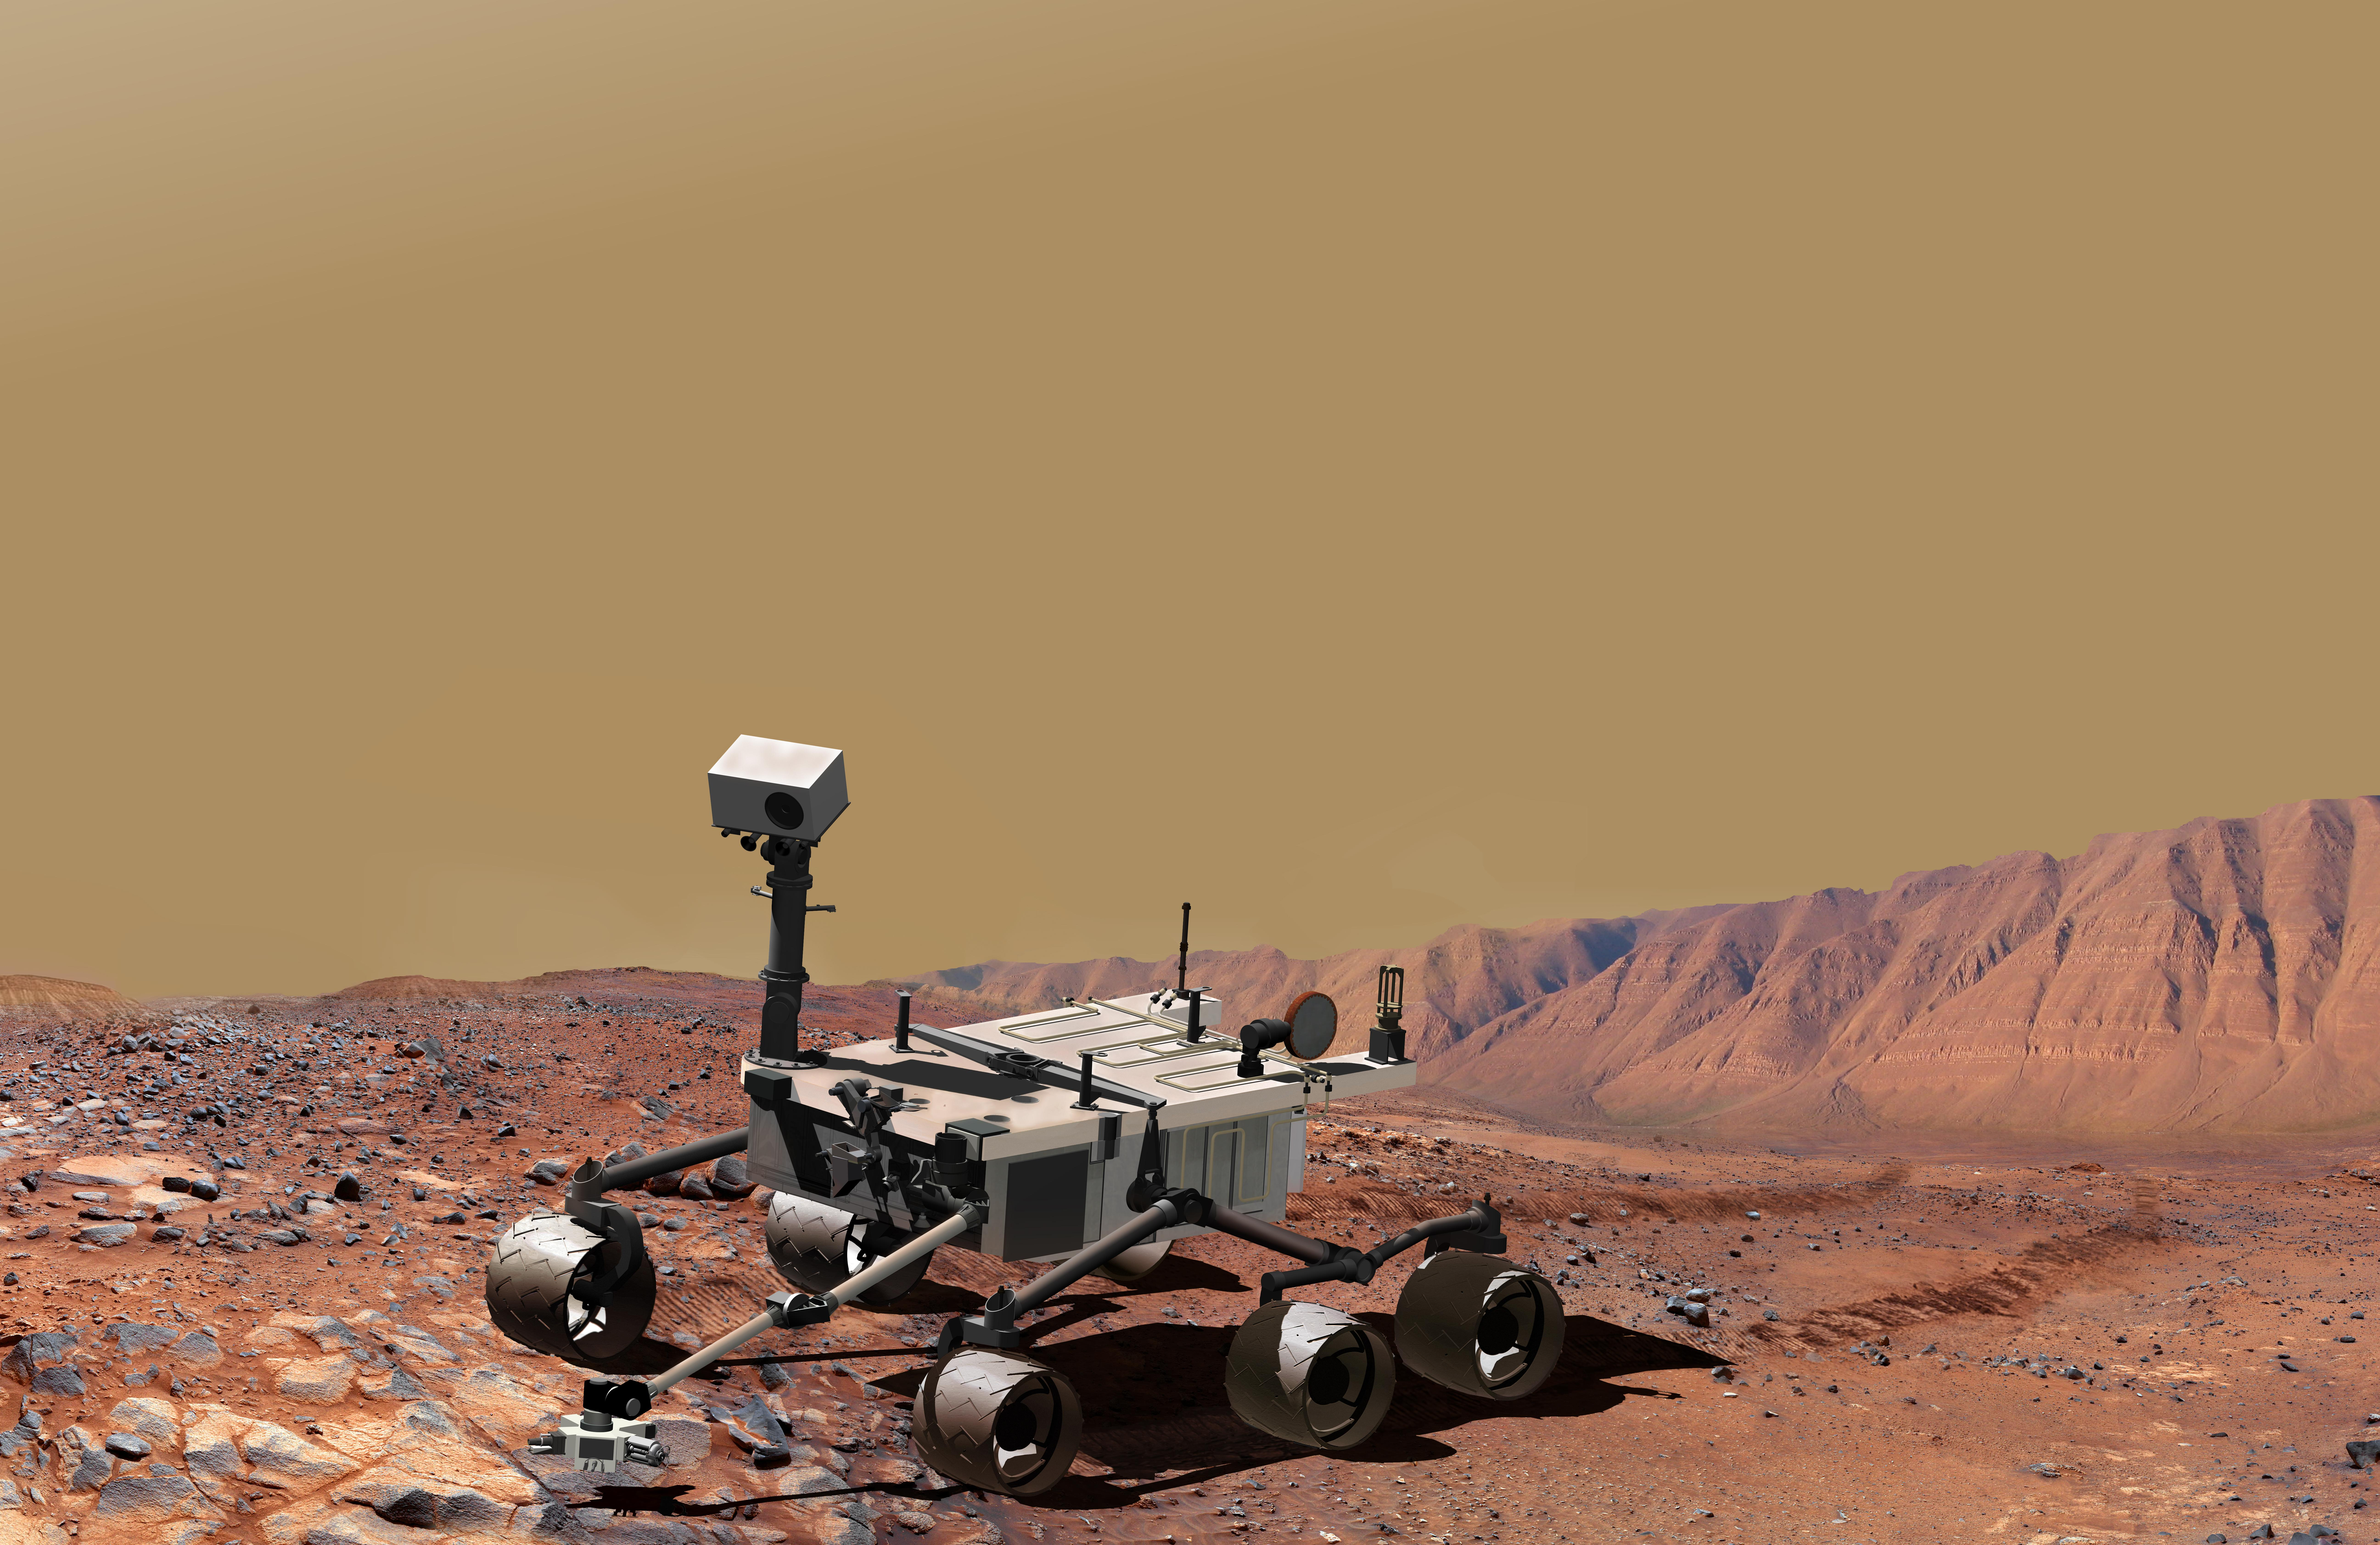 curiosity mars mission - HD10369×6419